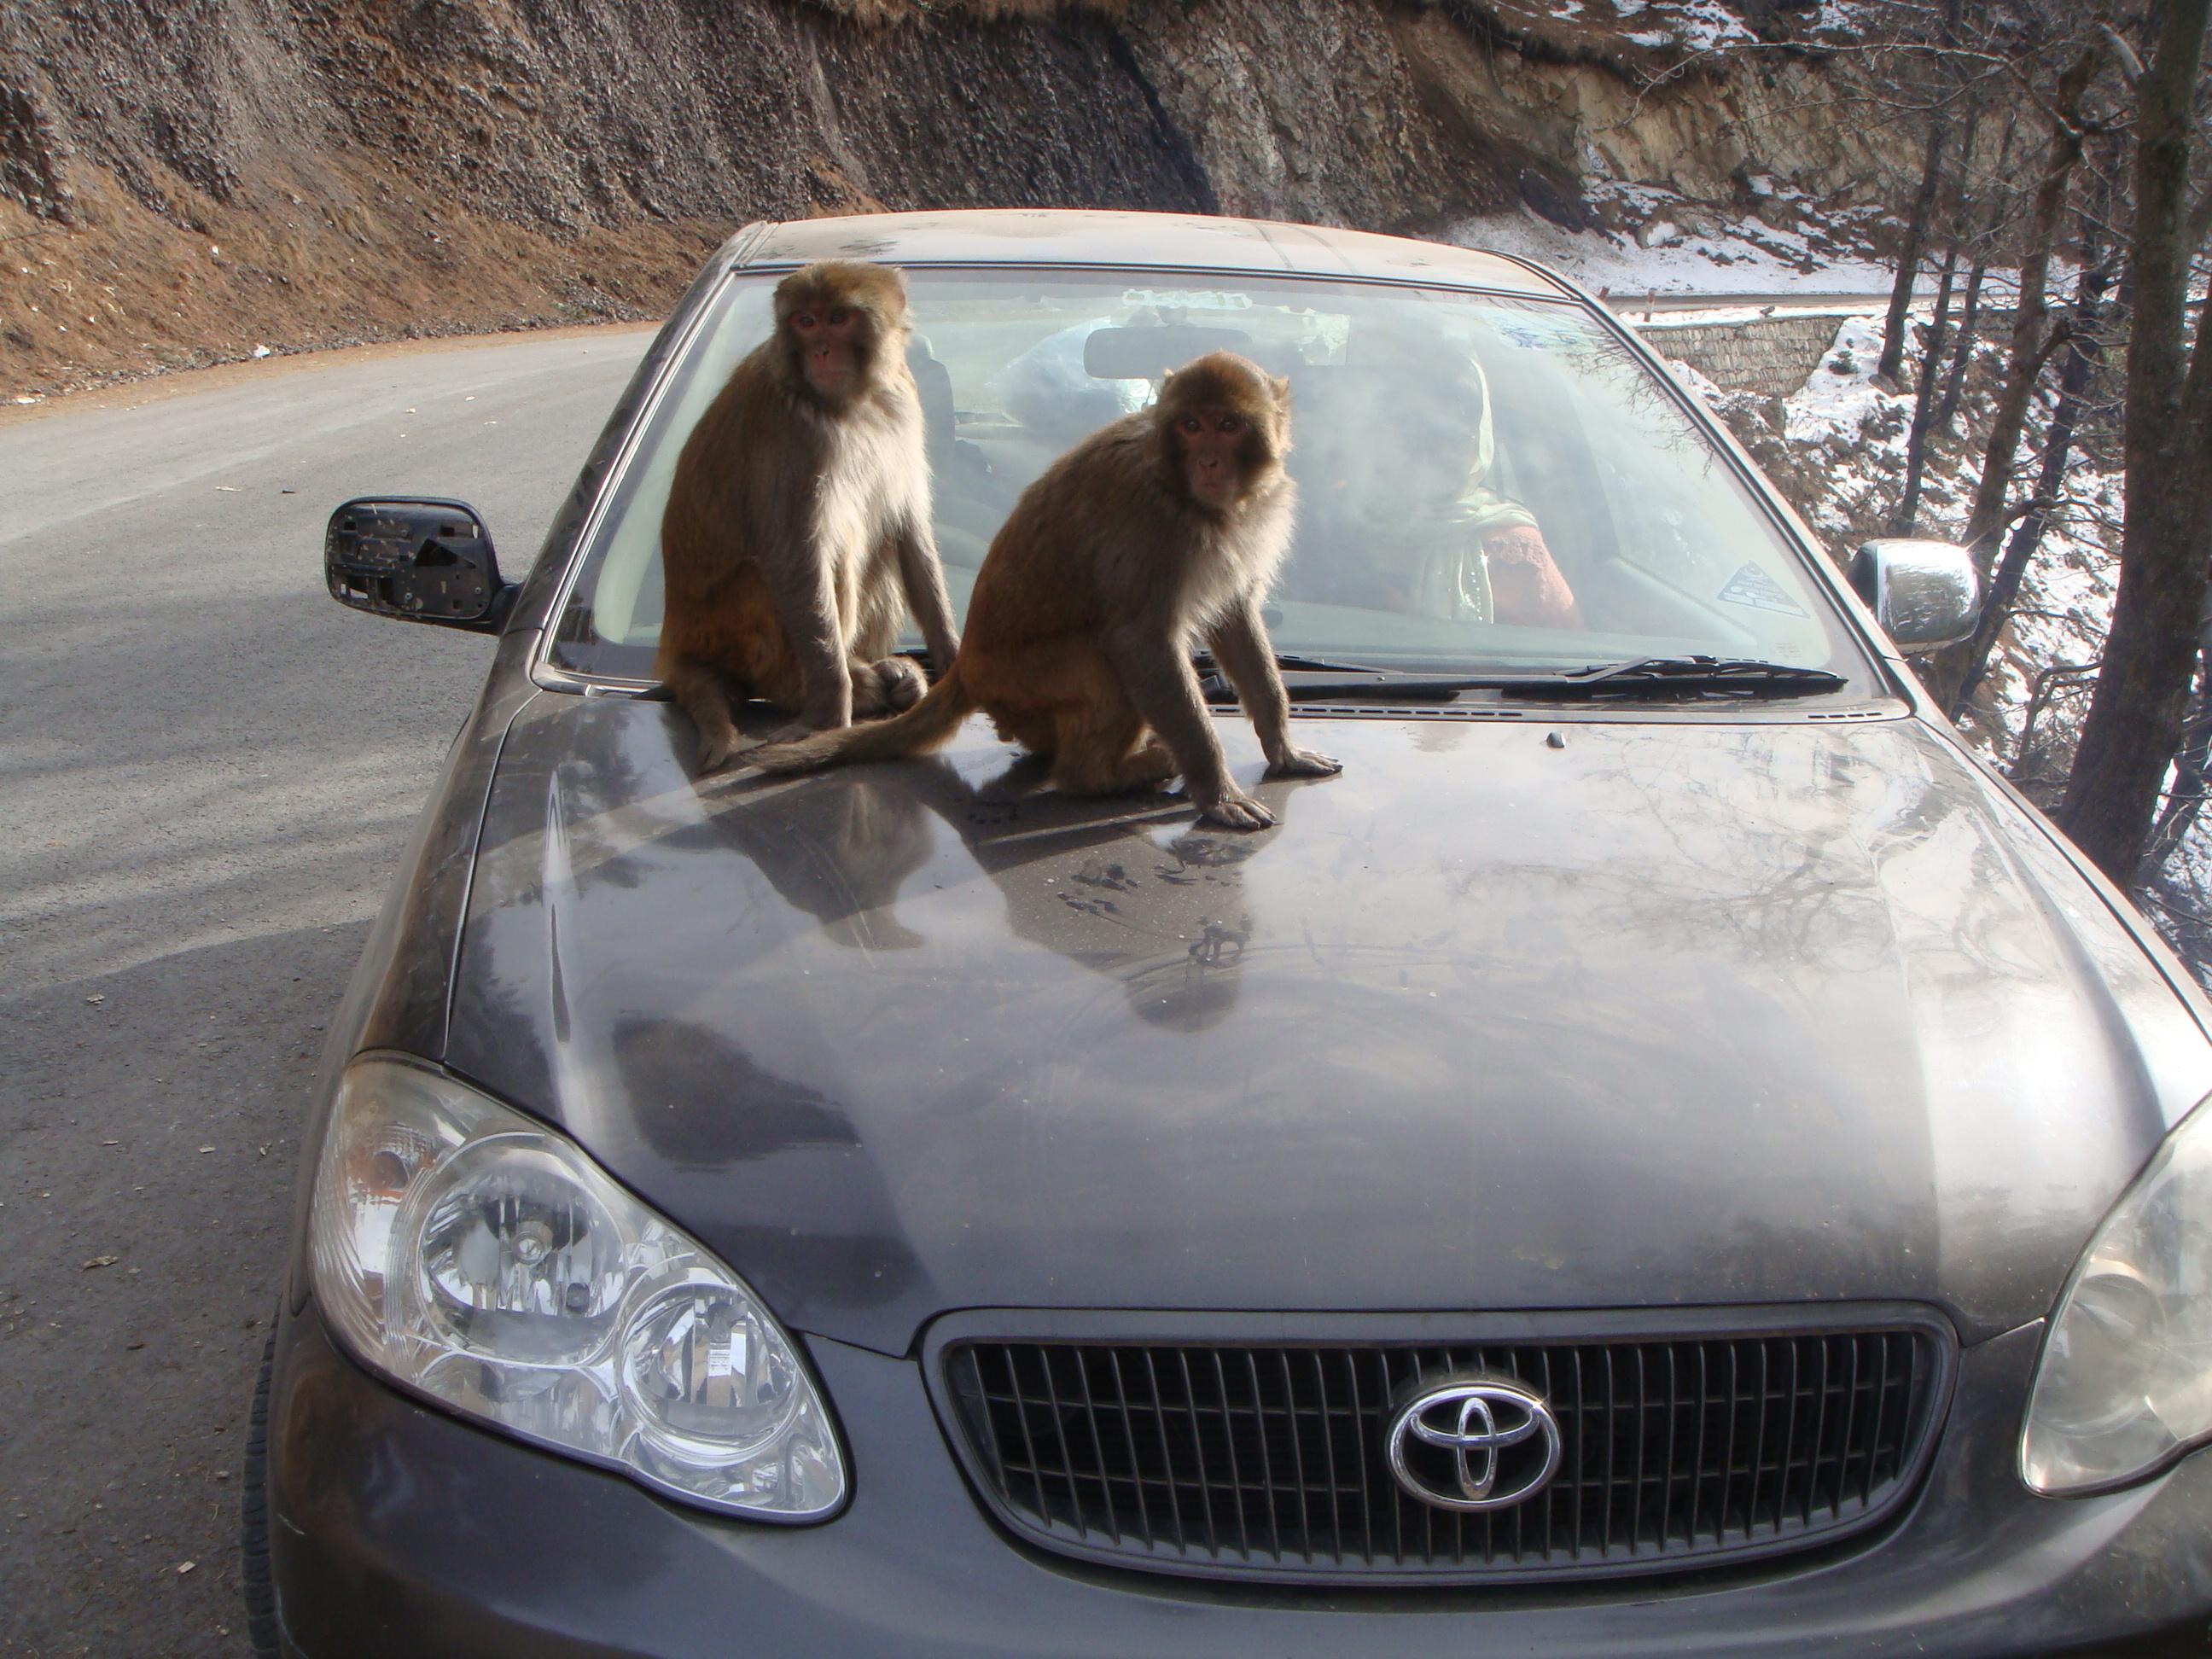 Monkeys on car, Animals, Apes, Blue, Car, HQ Photo